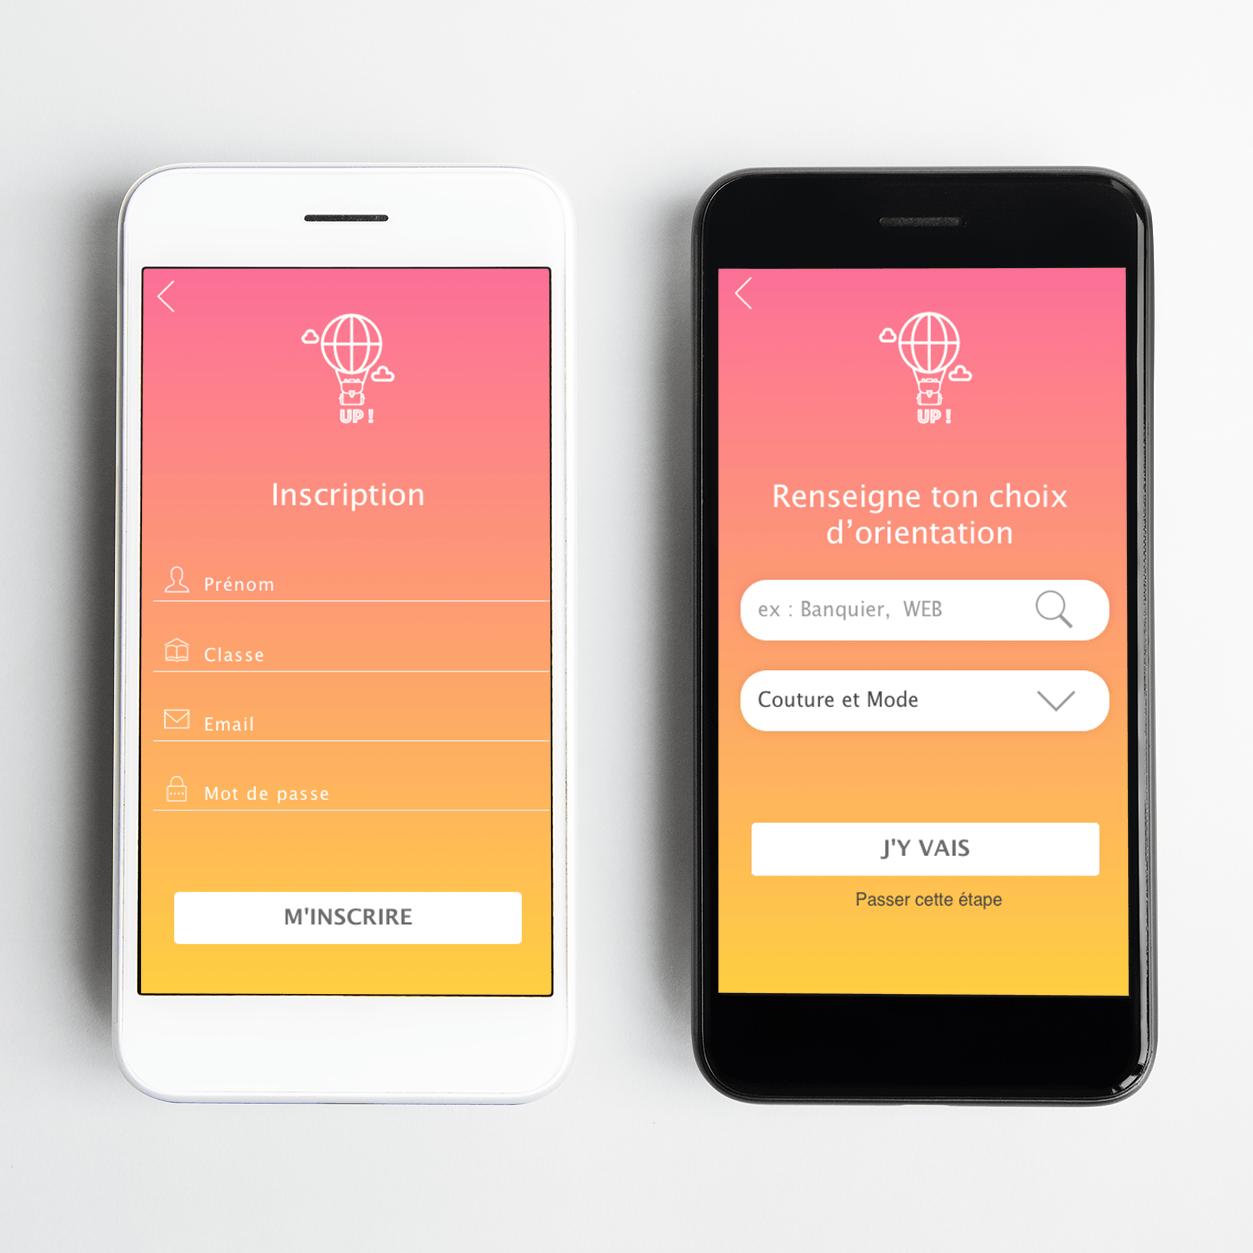 projet portfolio : UI design UP!